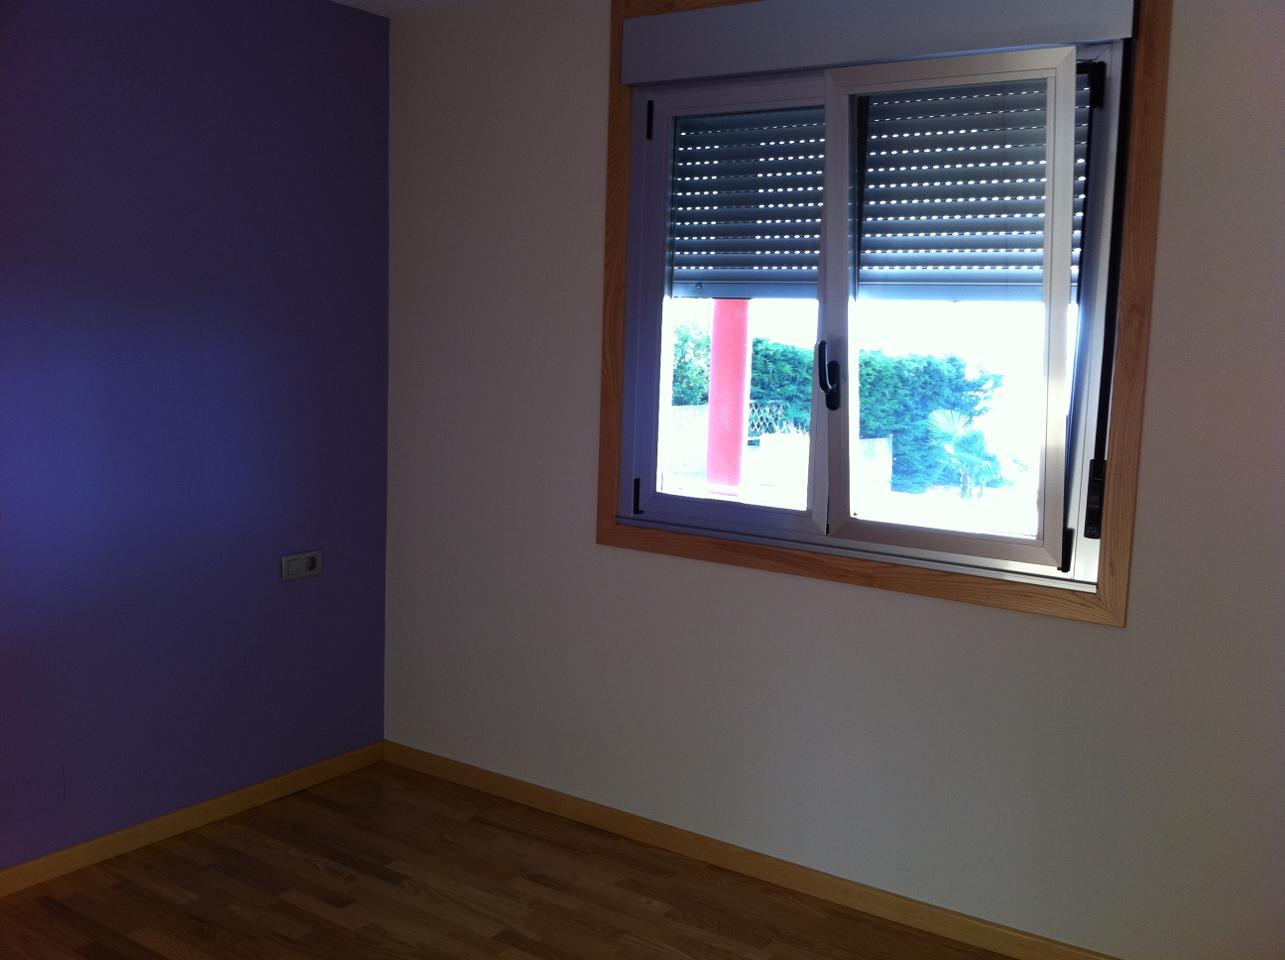 Nexo vigo inmobiliaria casa chalet en venta en vigo de 260 m2 - Telefono casa del libro vigo ...